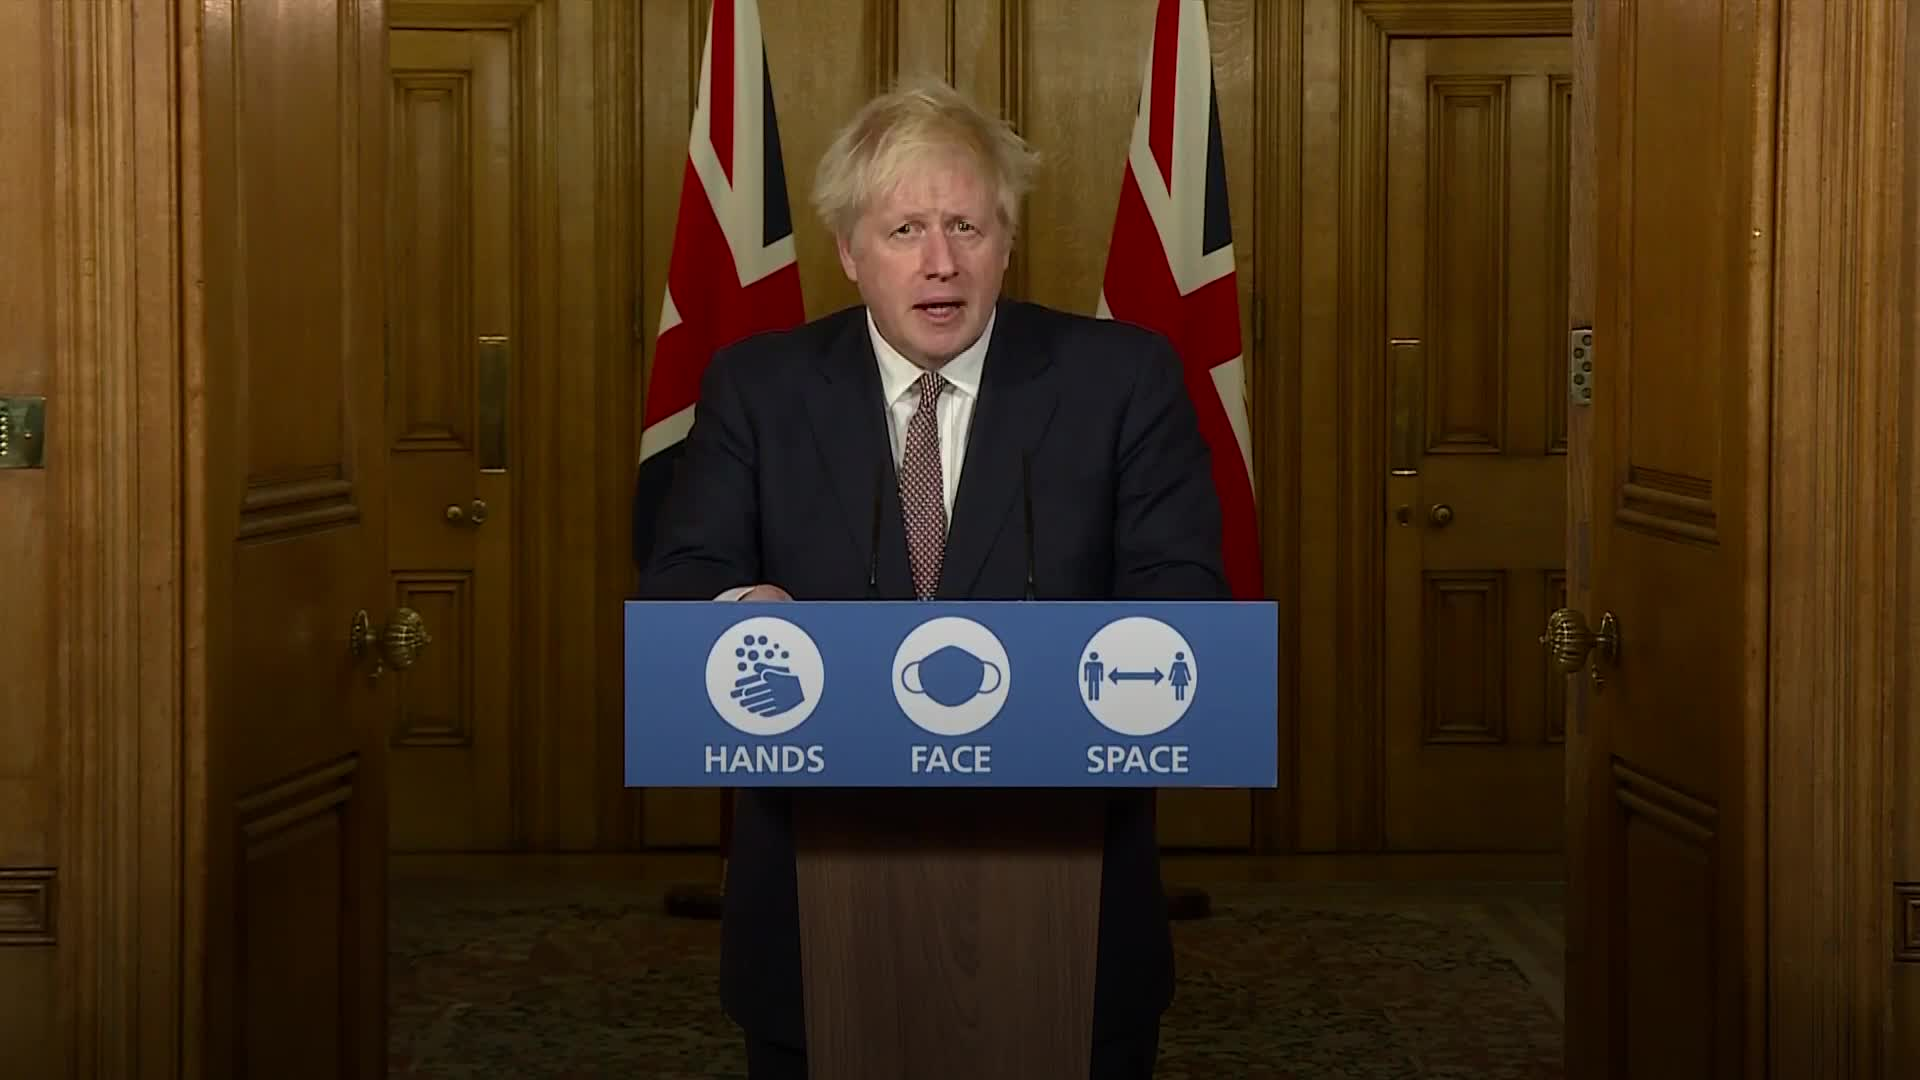 uk.news.yahoo.com: Boris Johnson: If we ease off now we risking losing control of this virus